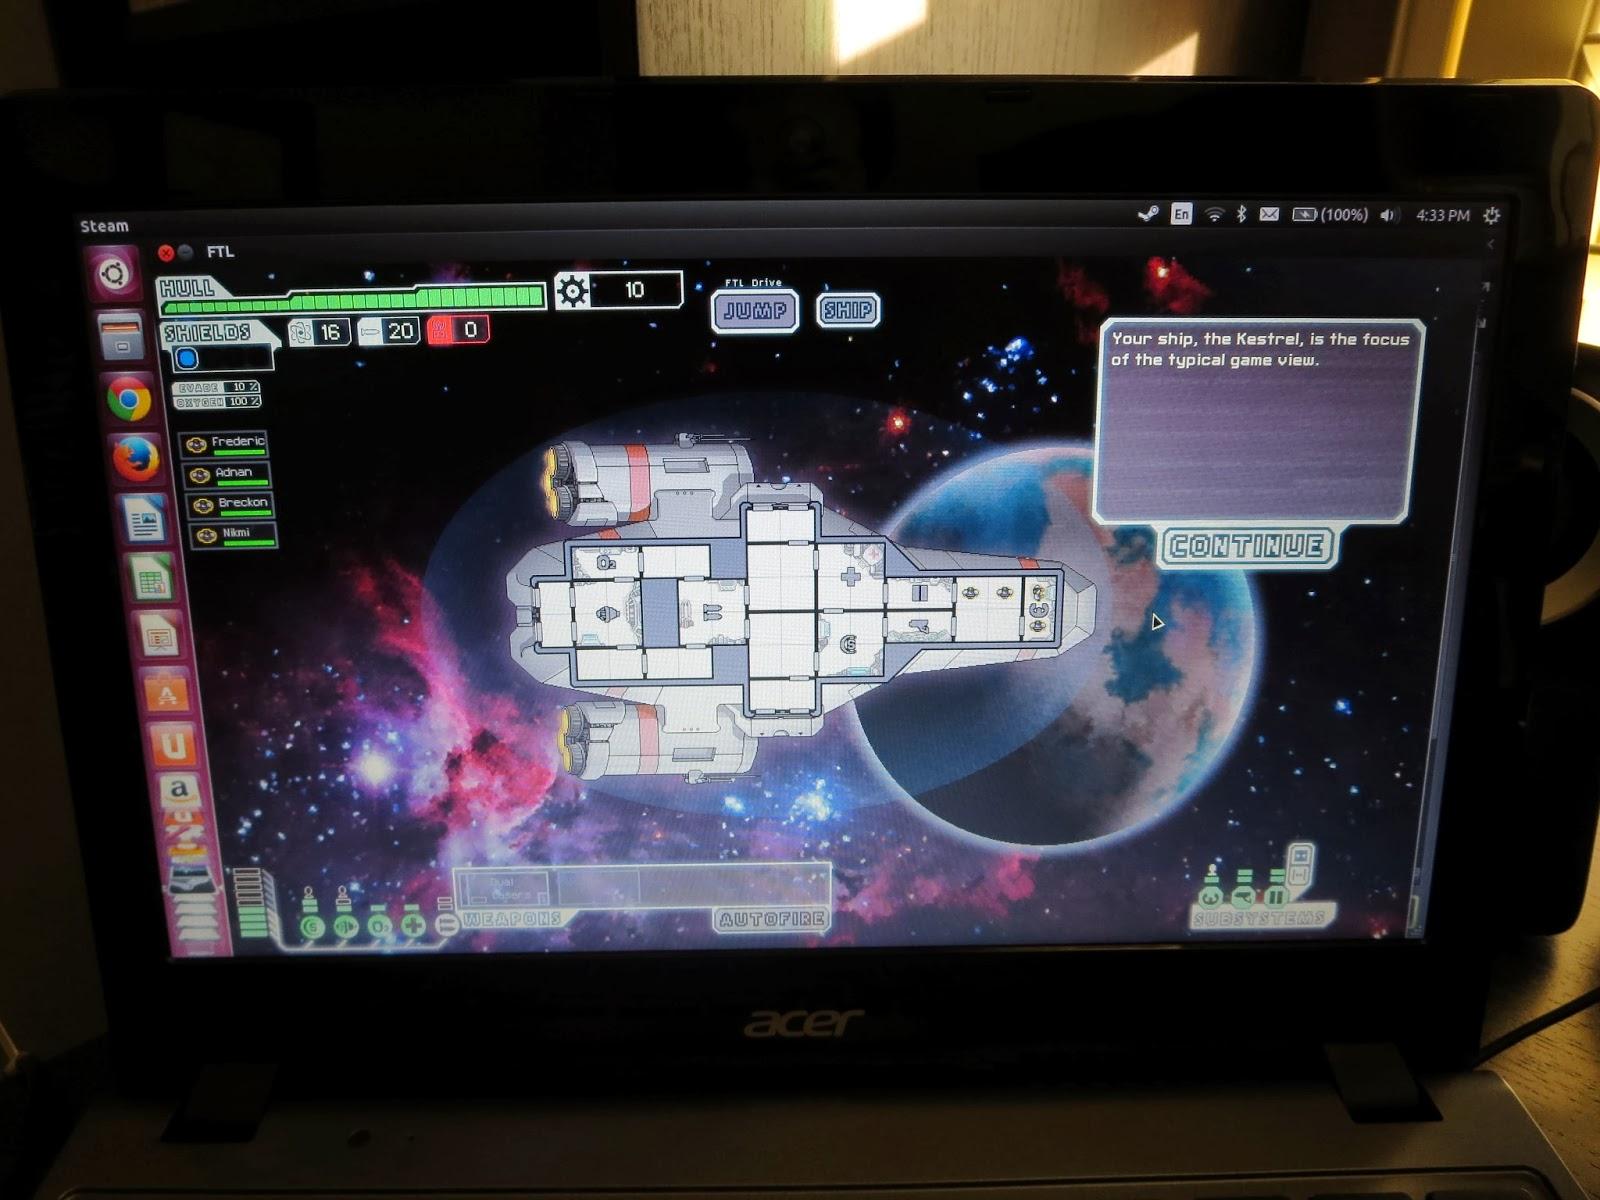 ARogan: Acer c720 Chromebook (Haswell)